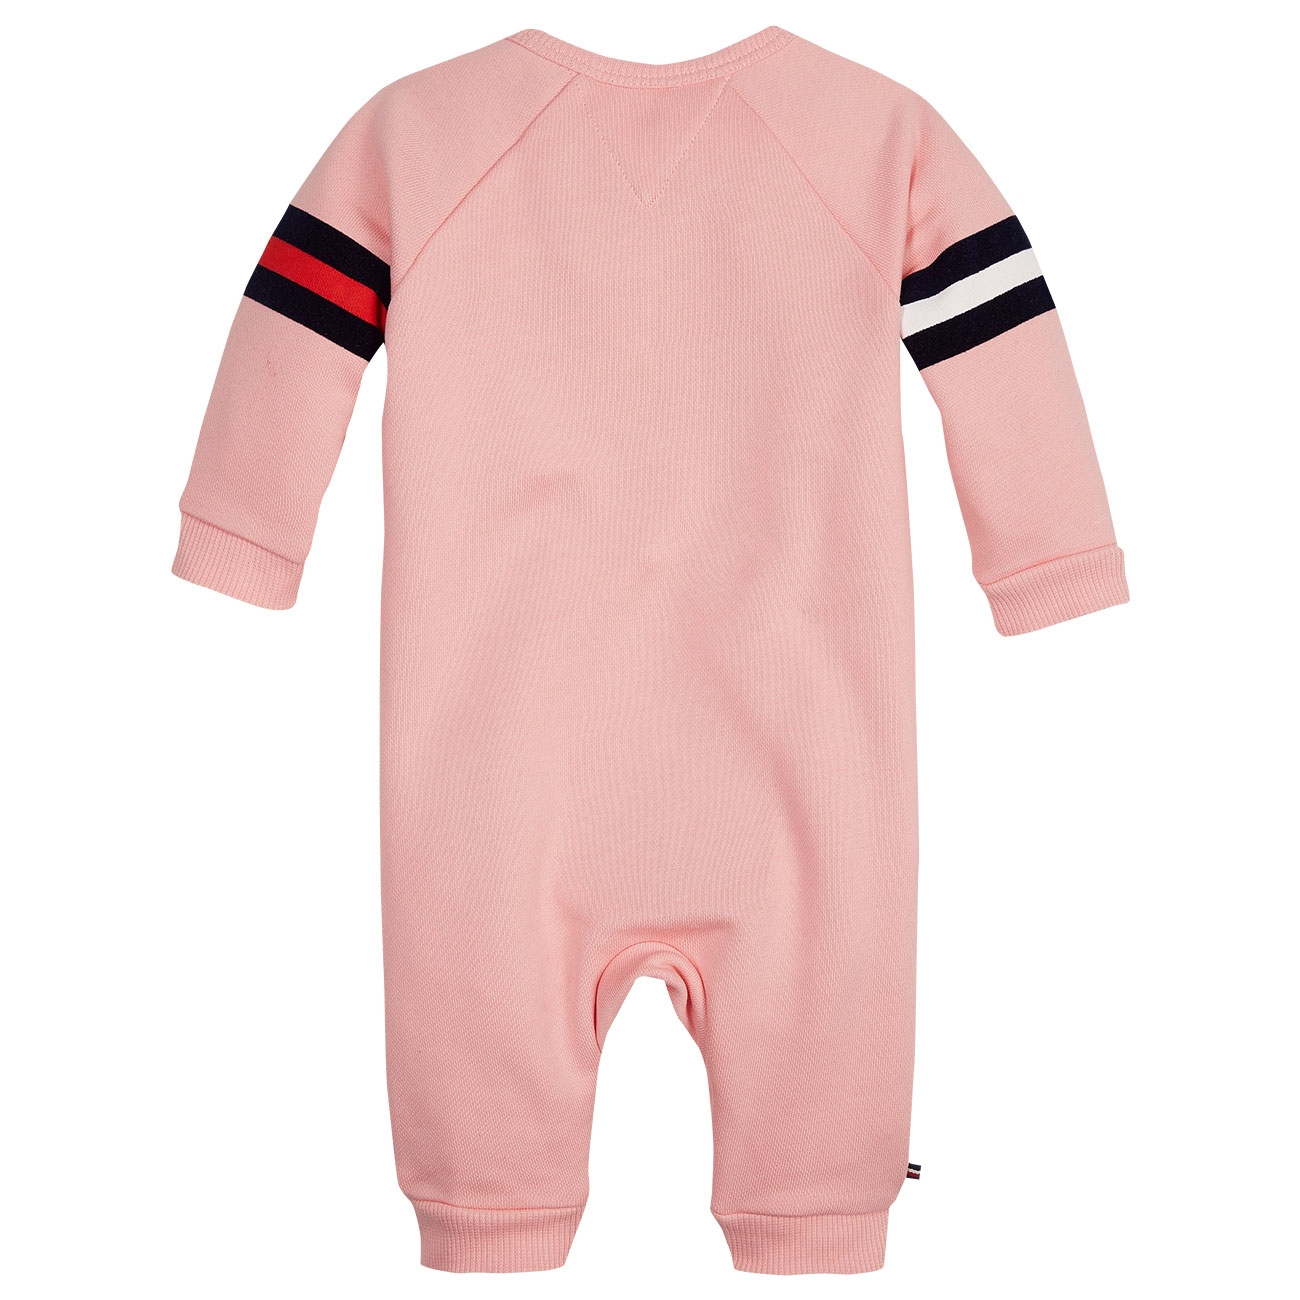 cc48f1e0395 Tommy Hilfiger Baby Heldragt Pink Icing